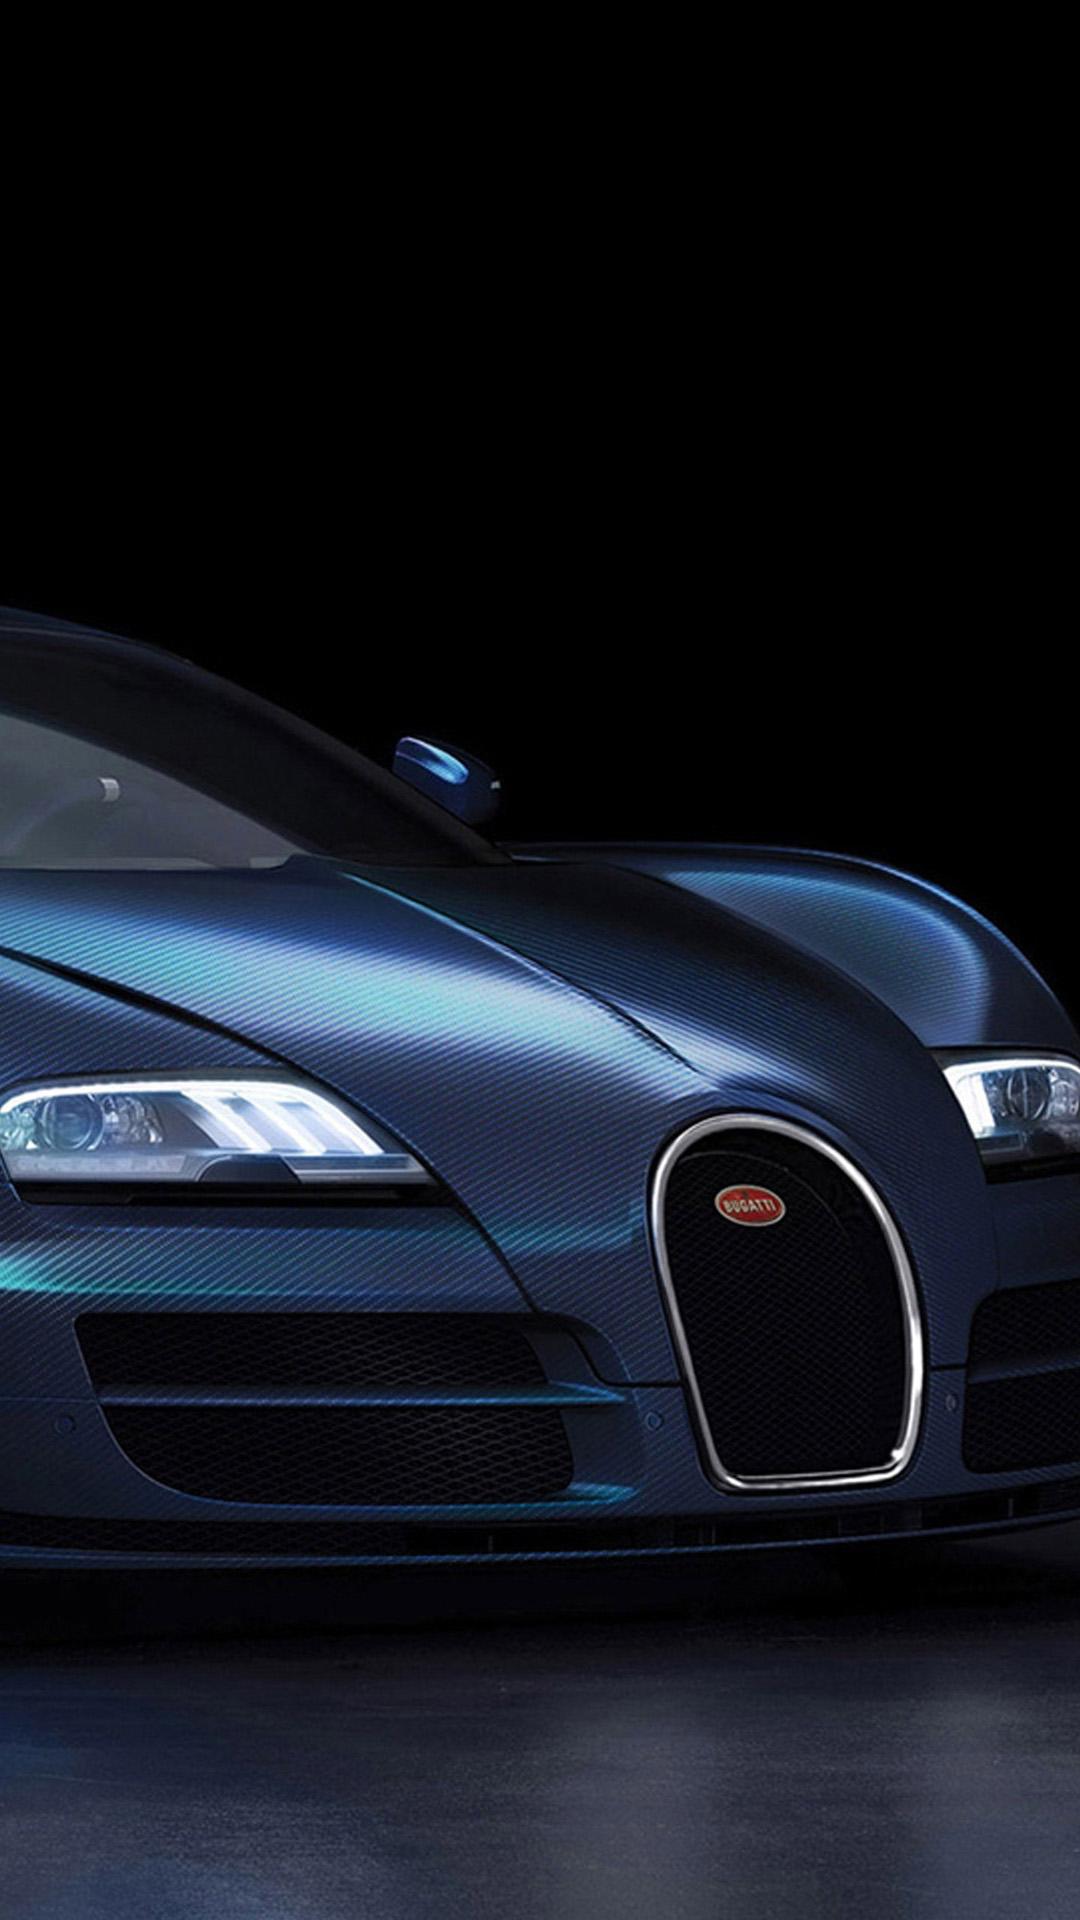 Bugatti Veyron Bugatti Hd Wallpaper For Iphone 1080x1920 Download Hd Wallpaper Wallpapertip